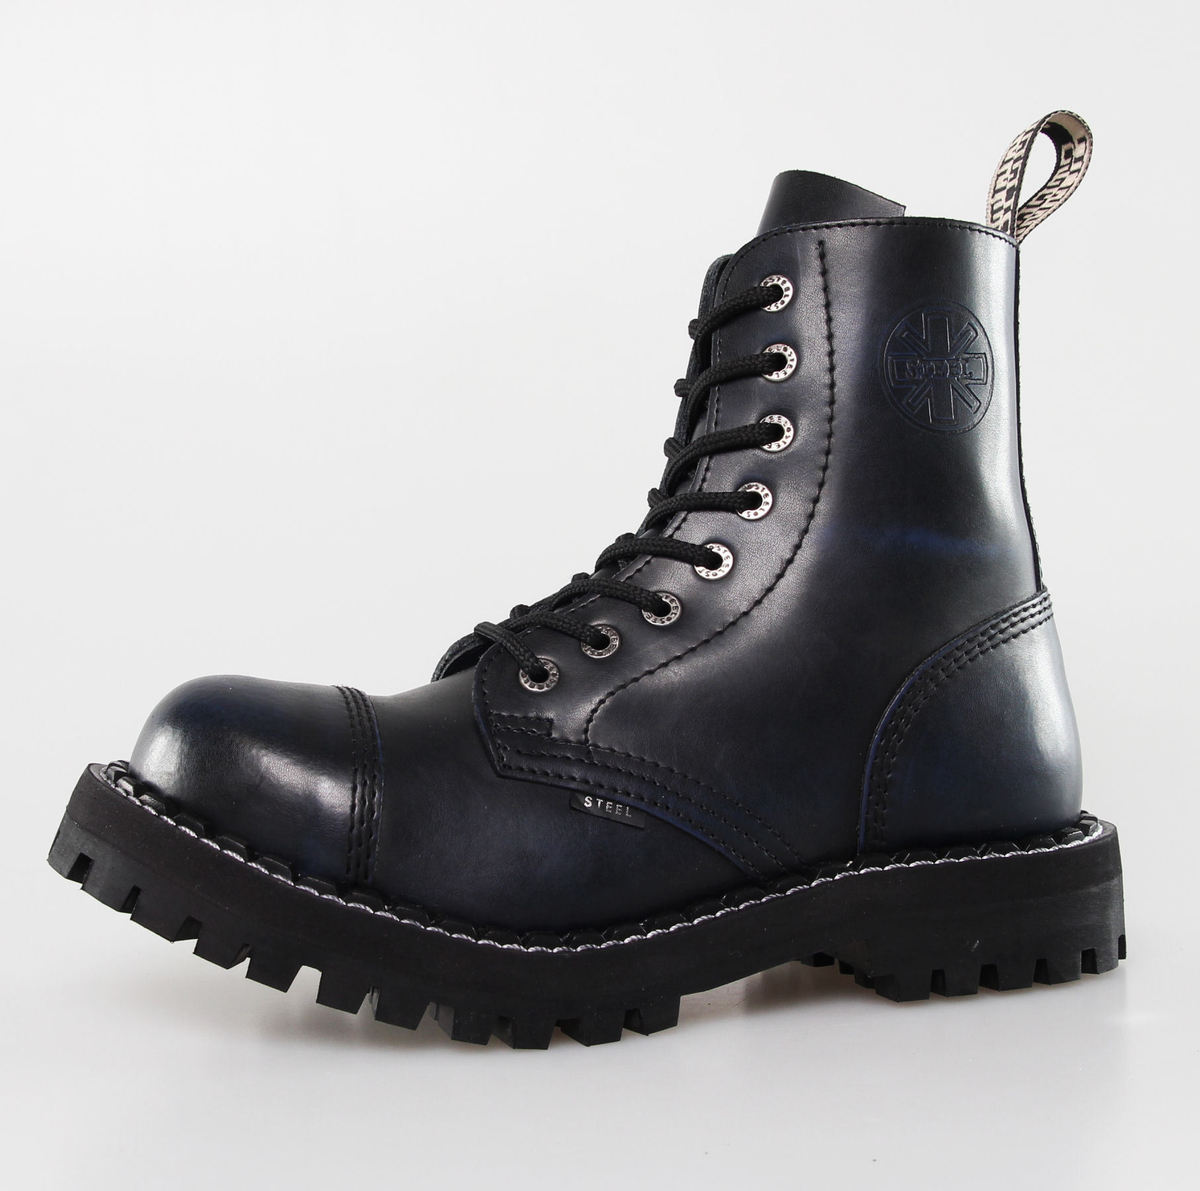 DOPRAVA ZADARMO topánky STEEL - 8 dierkové (113 114) 947d6b025a7